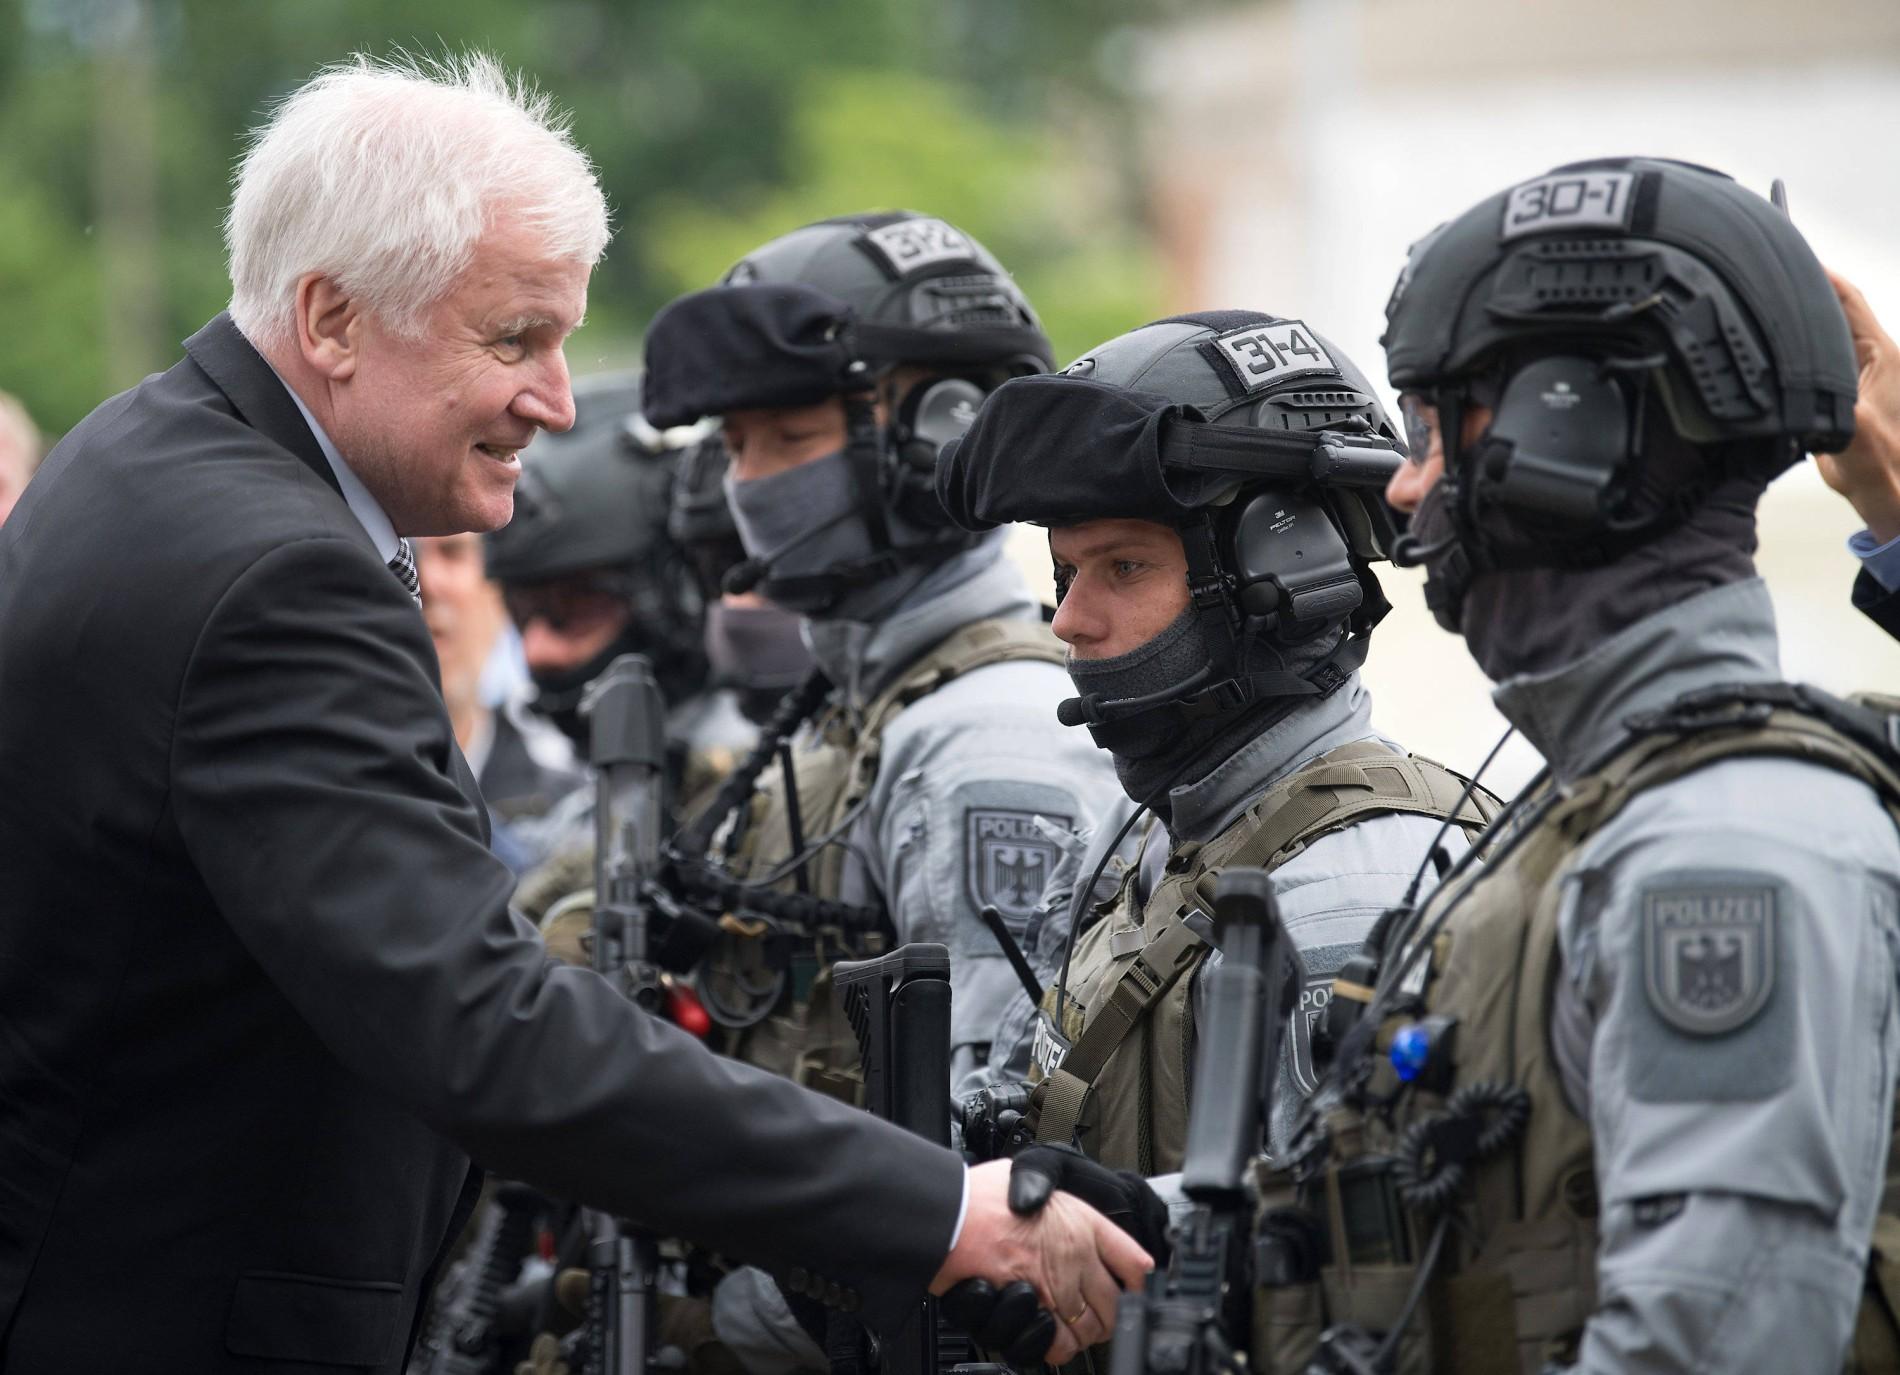 Counter terrorism terror in Germany